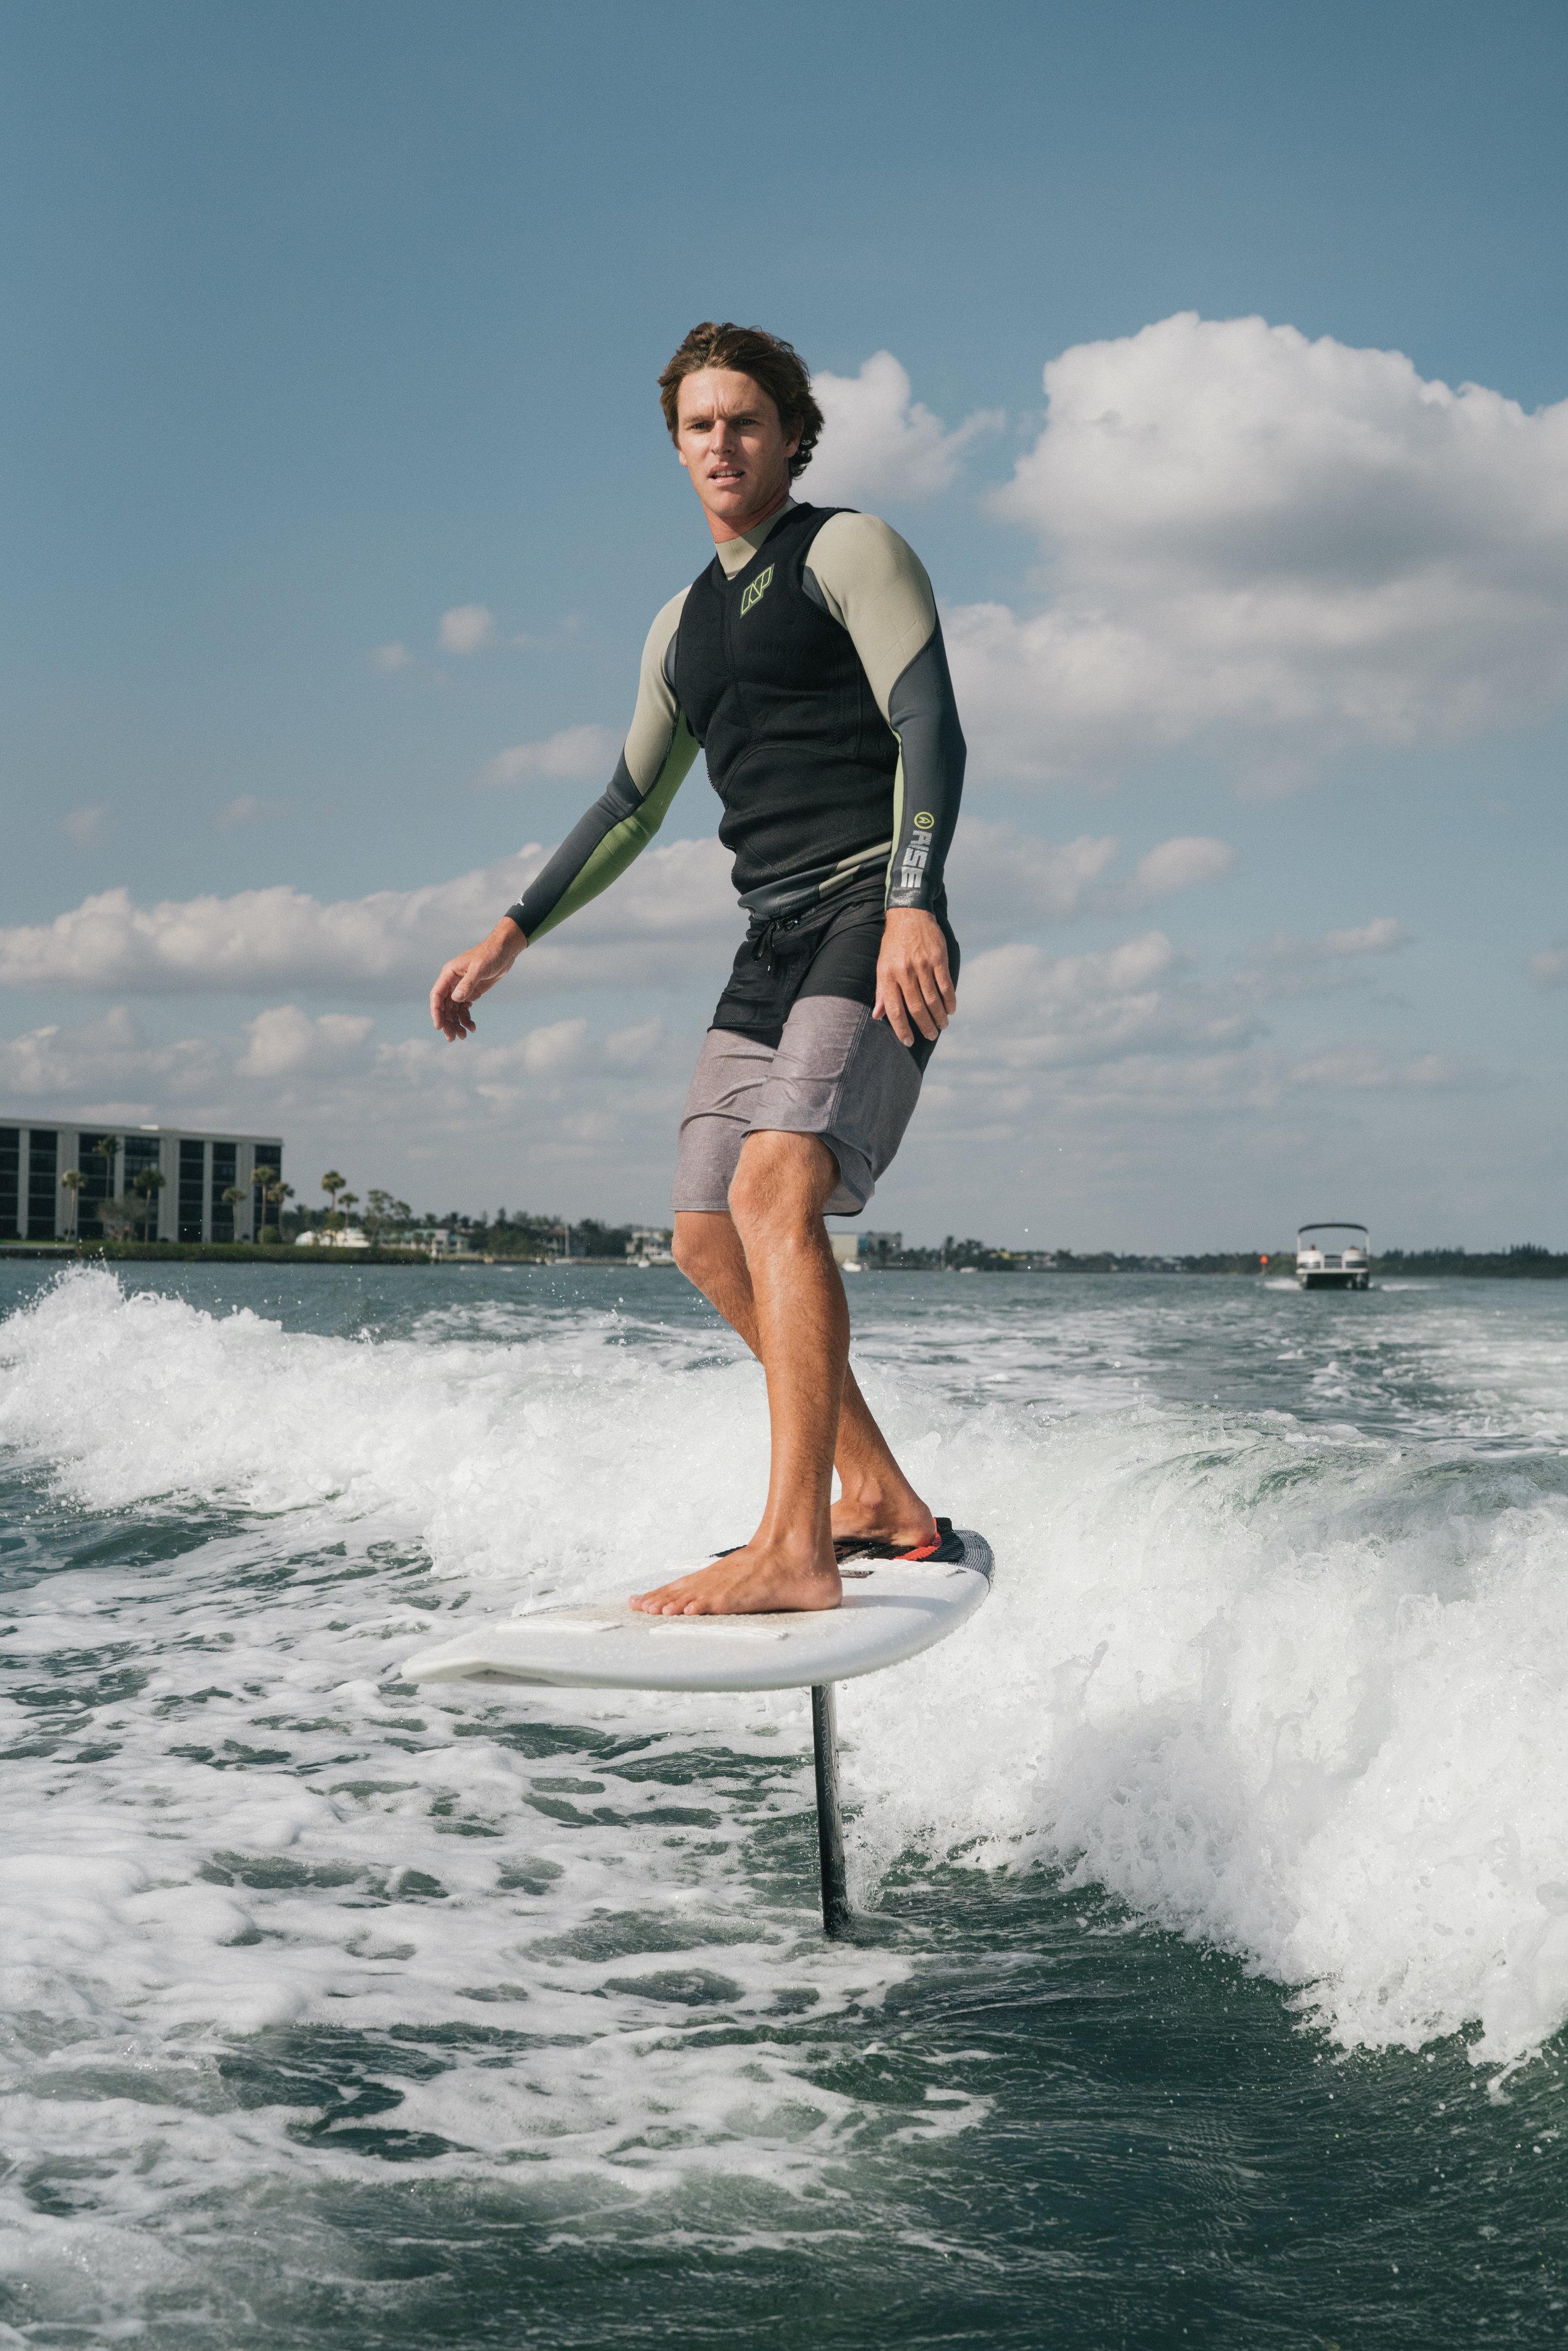 Wake foil surfing